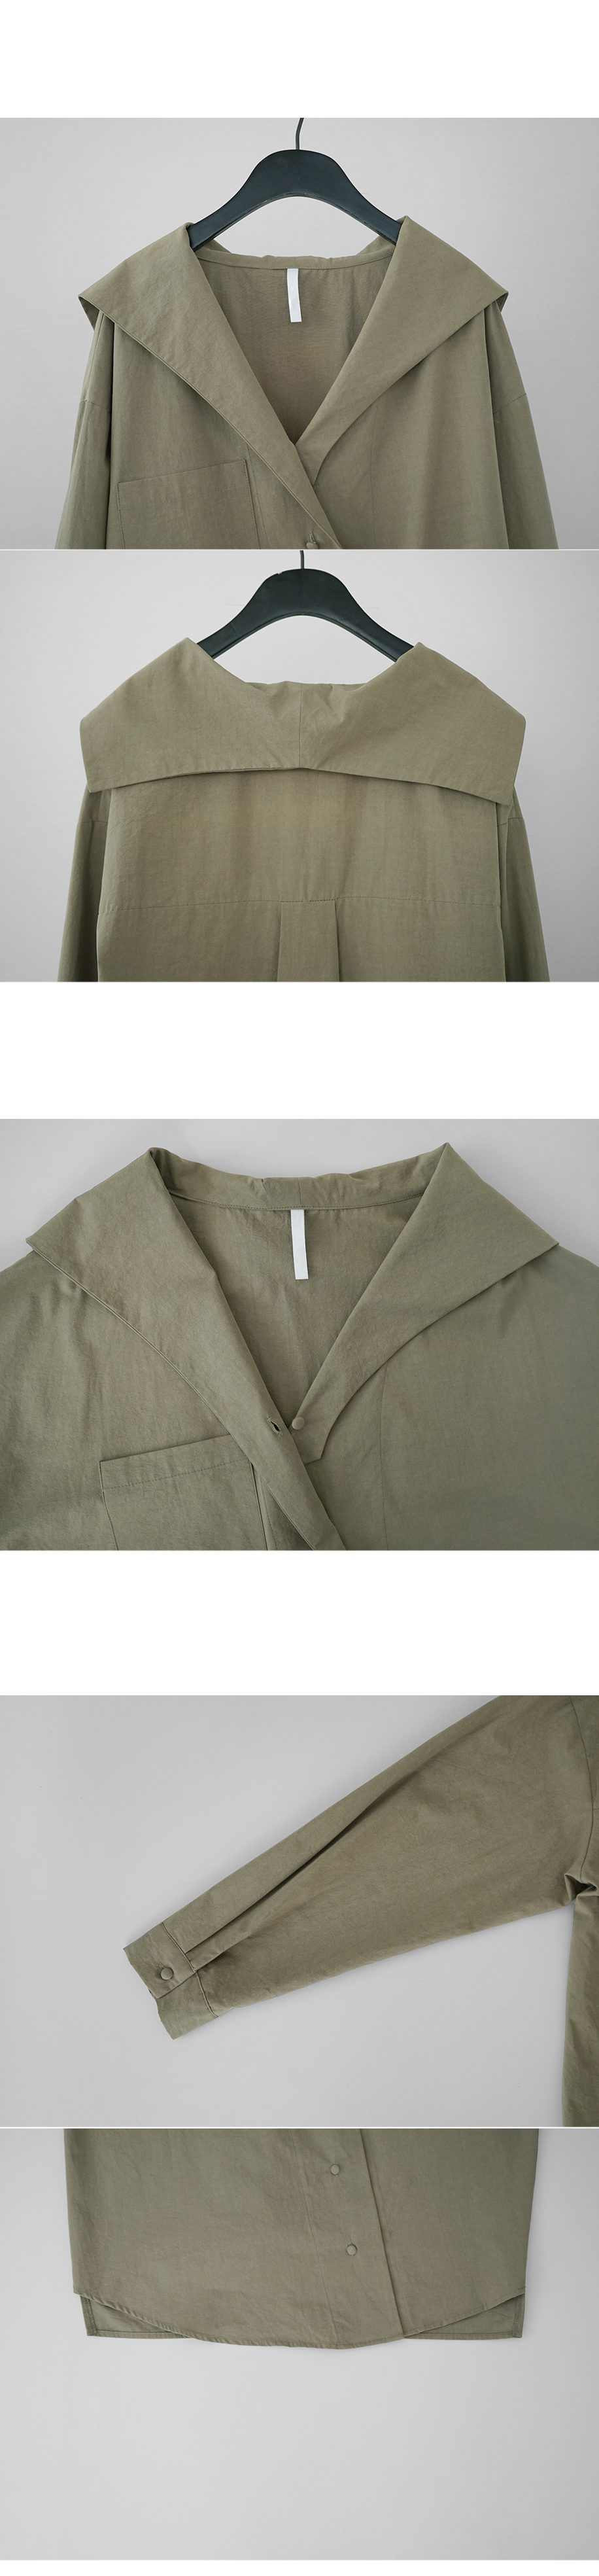 big pocket point sailor shirt